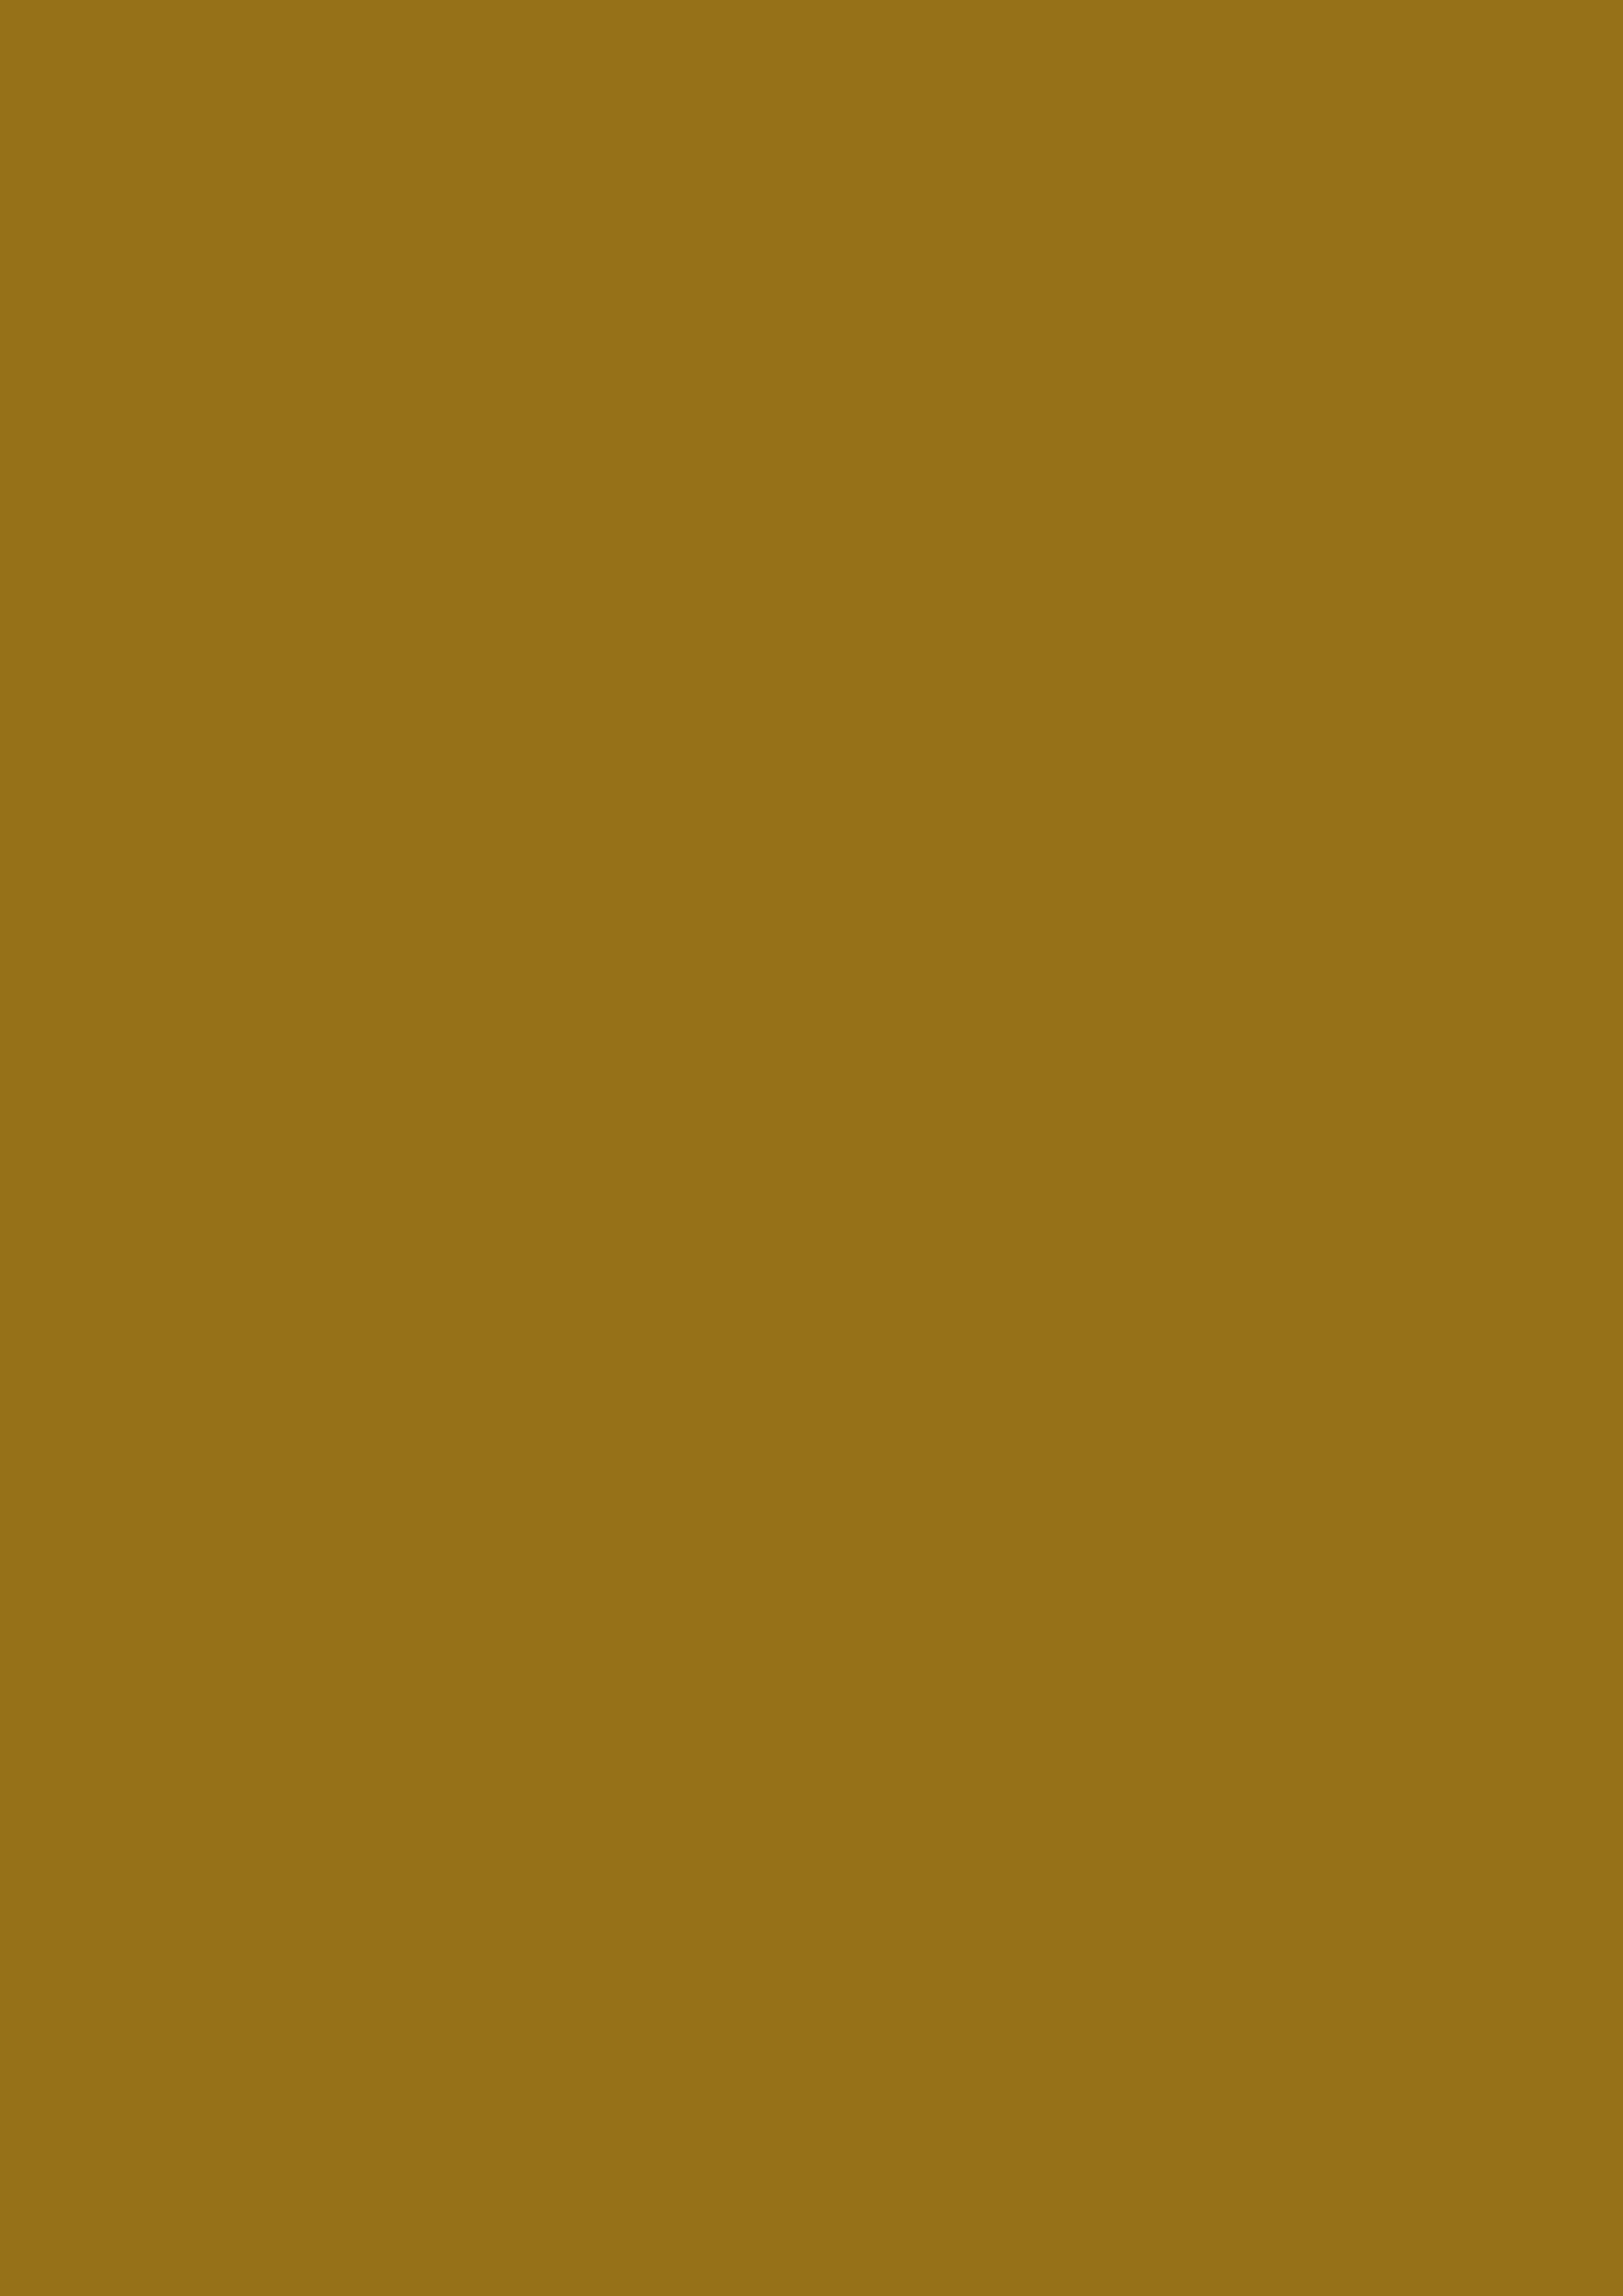 2480x3508 Mode Beige Solid Color Background